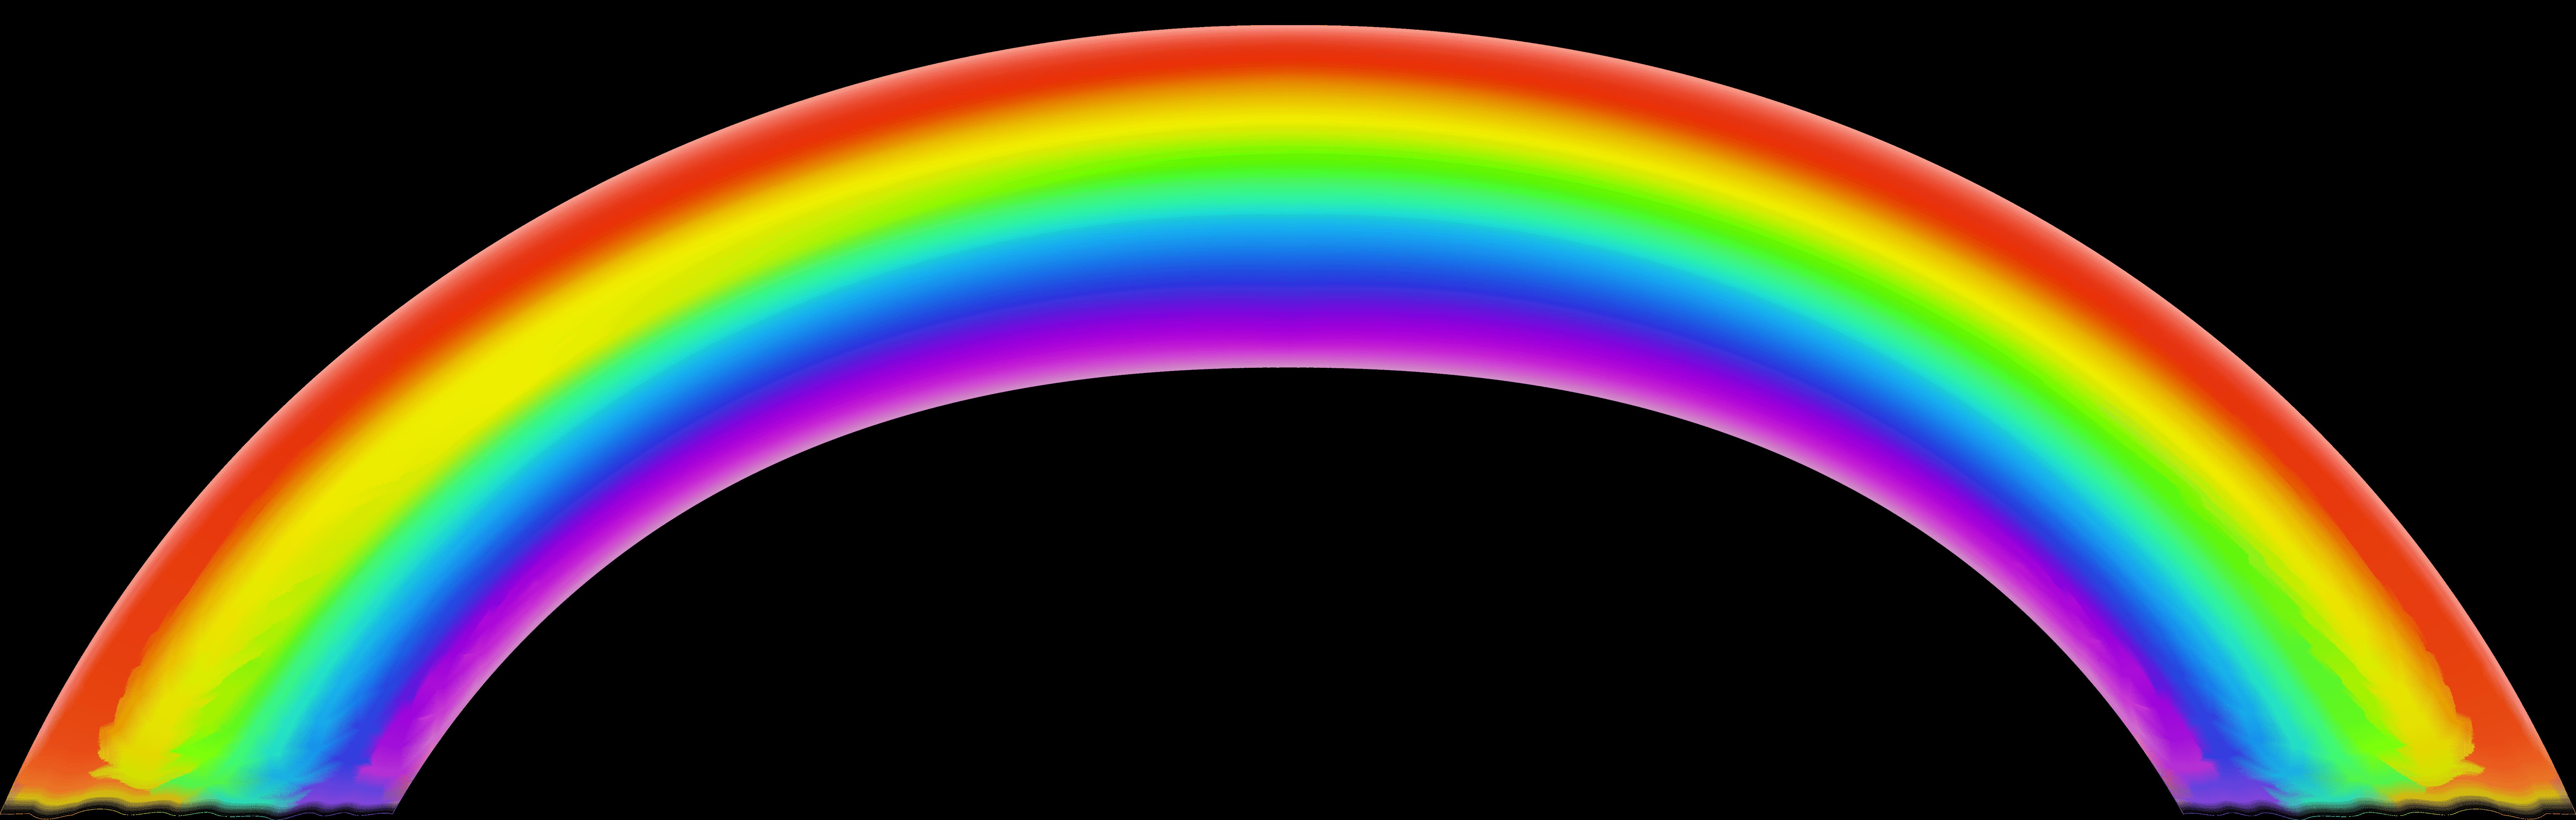 Free Transparent Rainbow Cliparts, Download Free Clip Art.